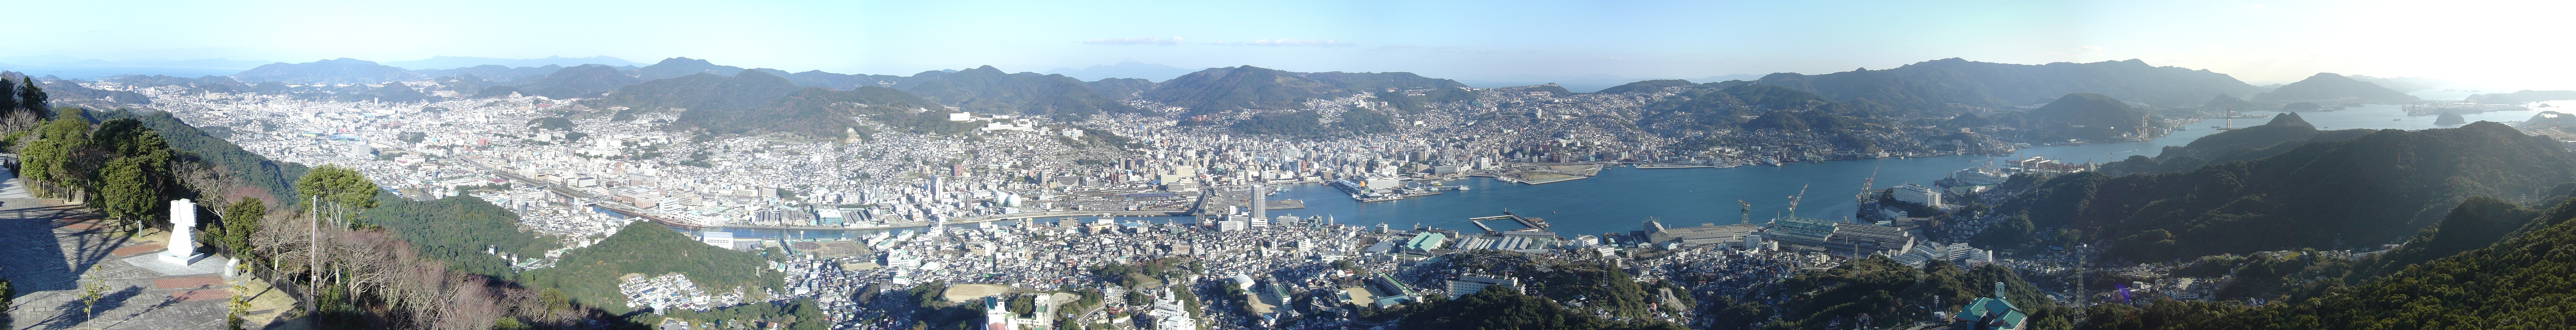 Nagasaki_vue_du_Mont_Inasa.jpg (7890×1012)